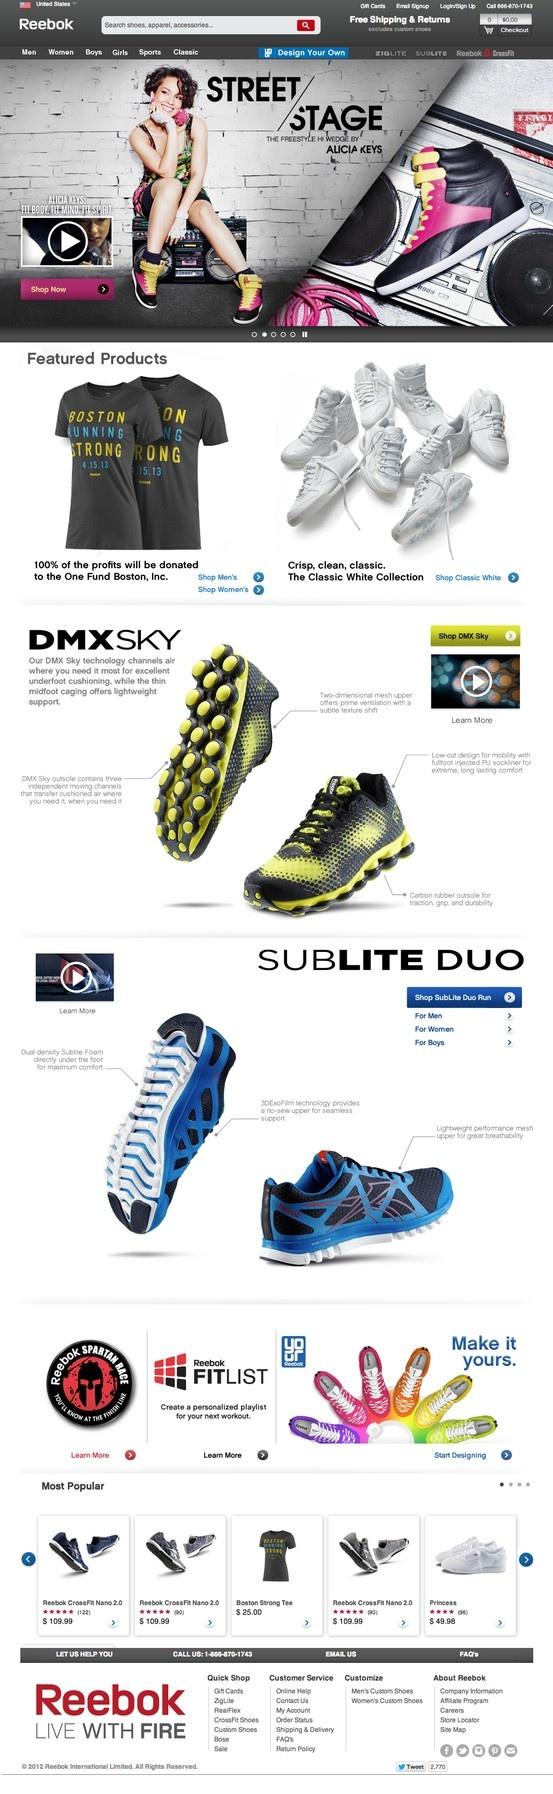 Reebok Footwear & Apparel - Be More Human